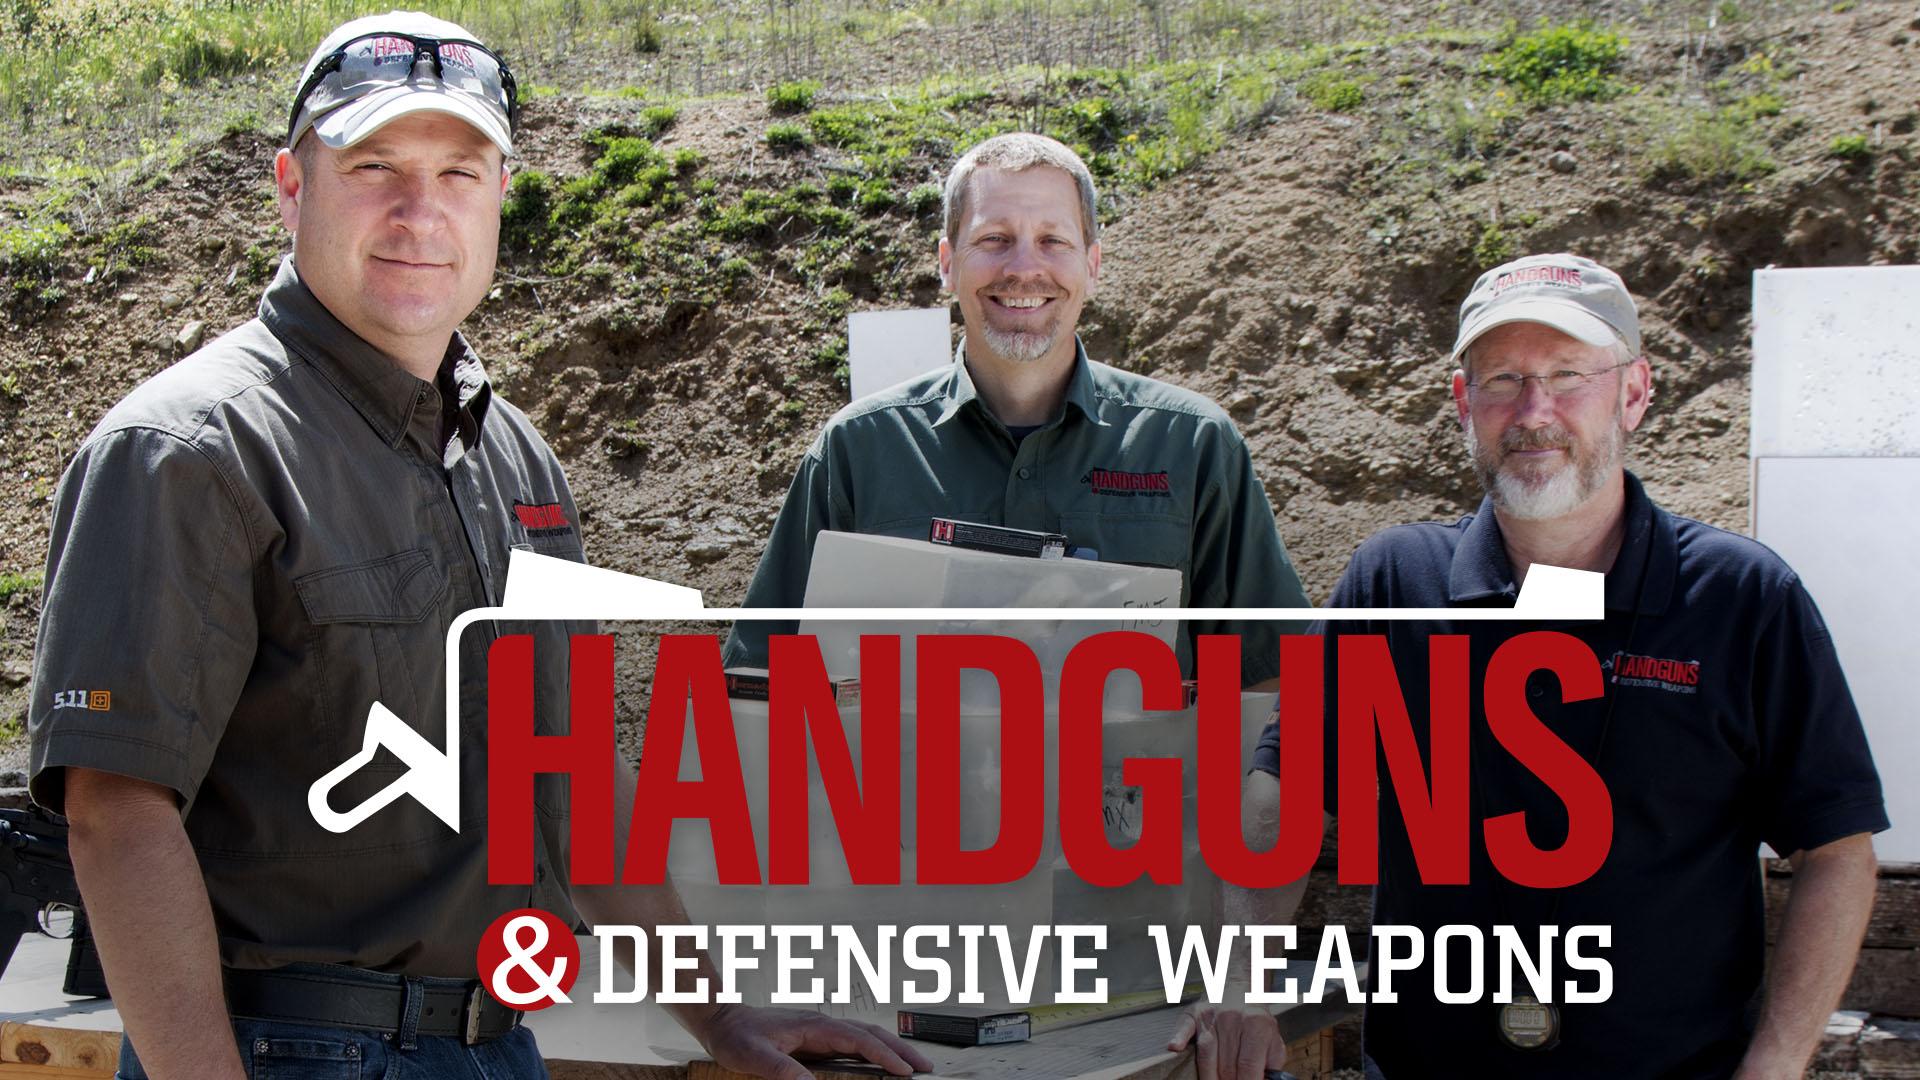 Handguns & Defensive Weapons